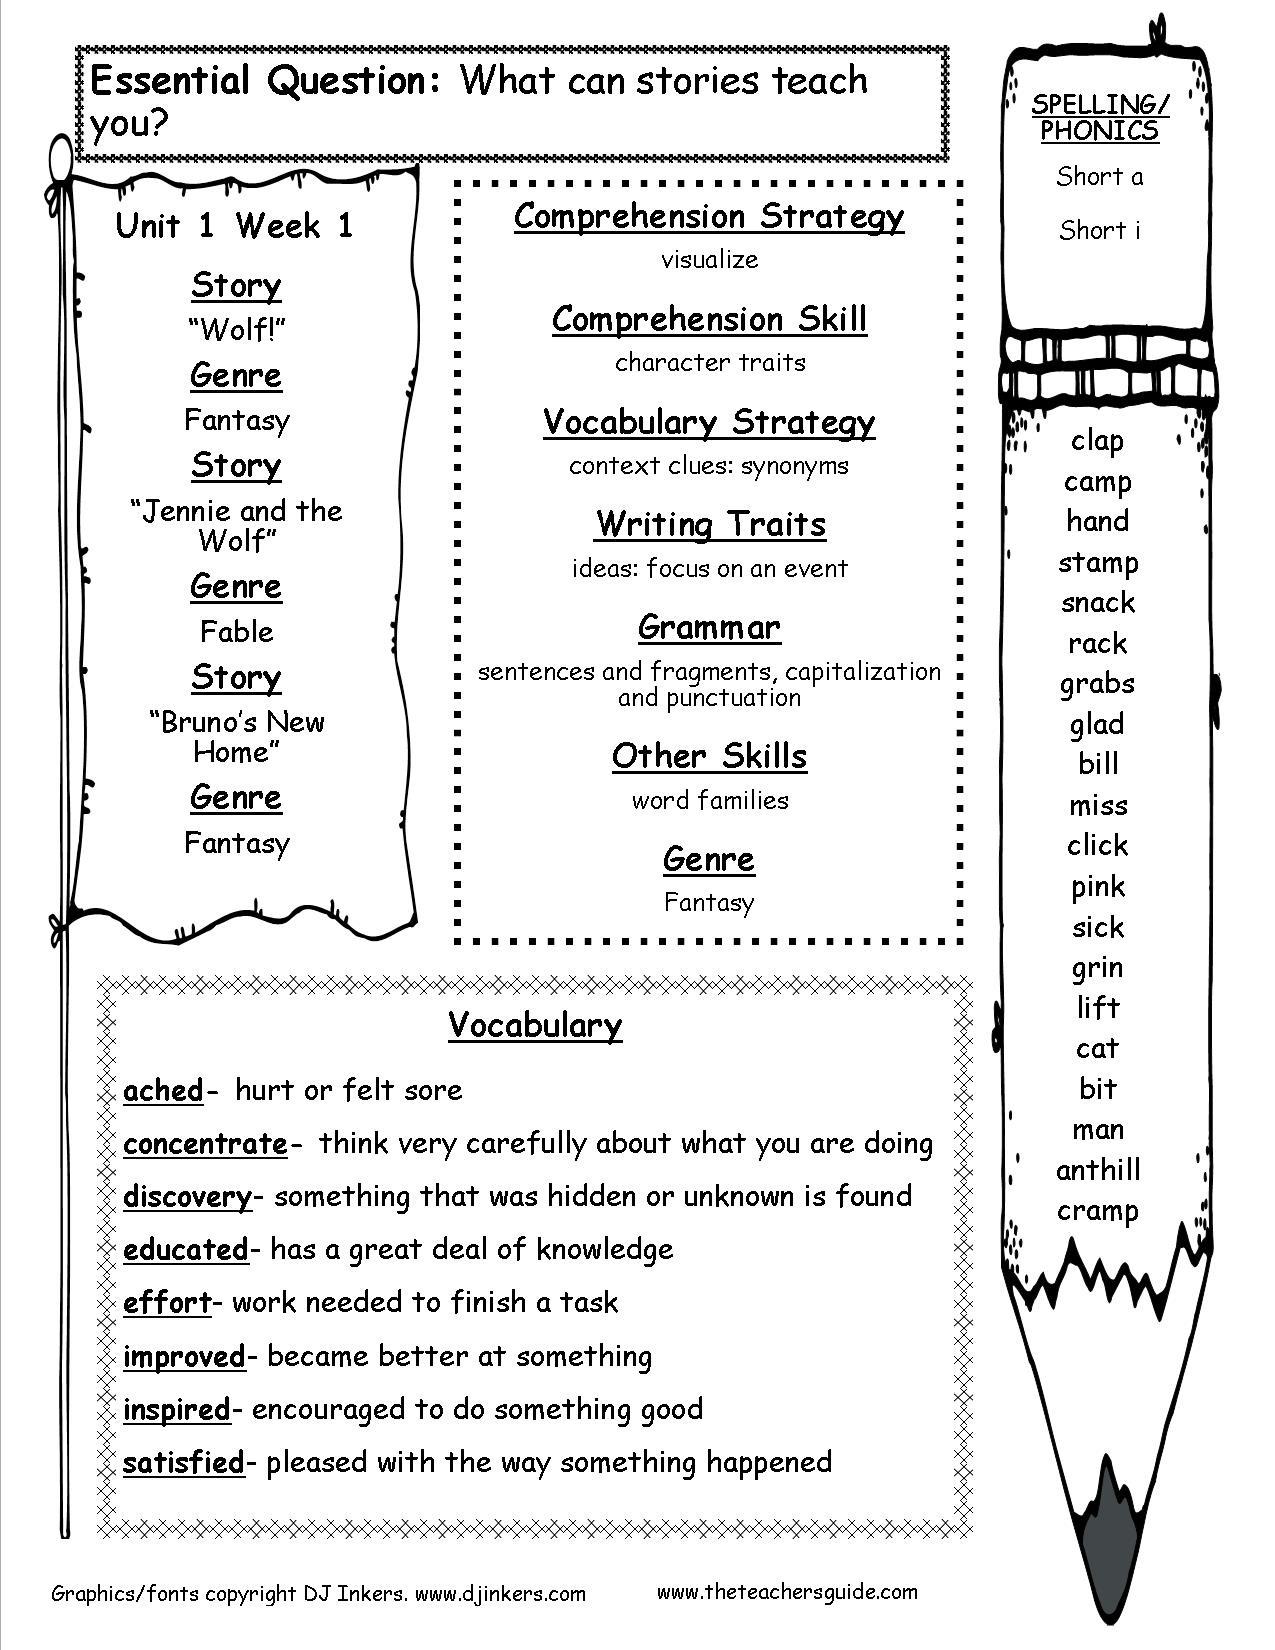 Free Teacher Resources Printables